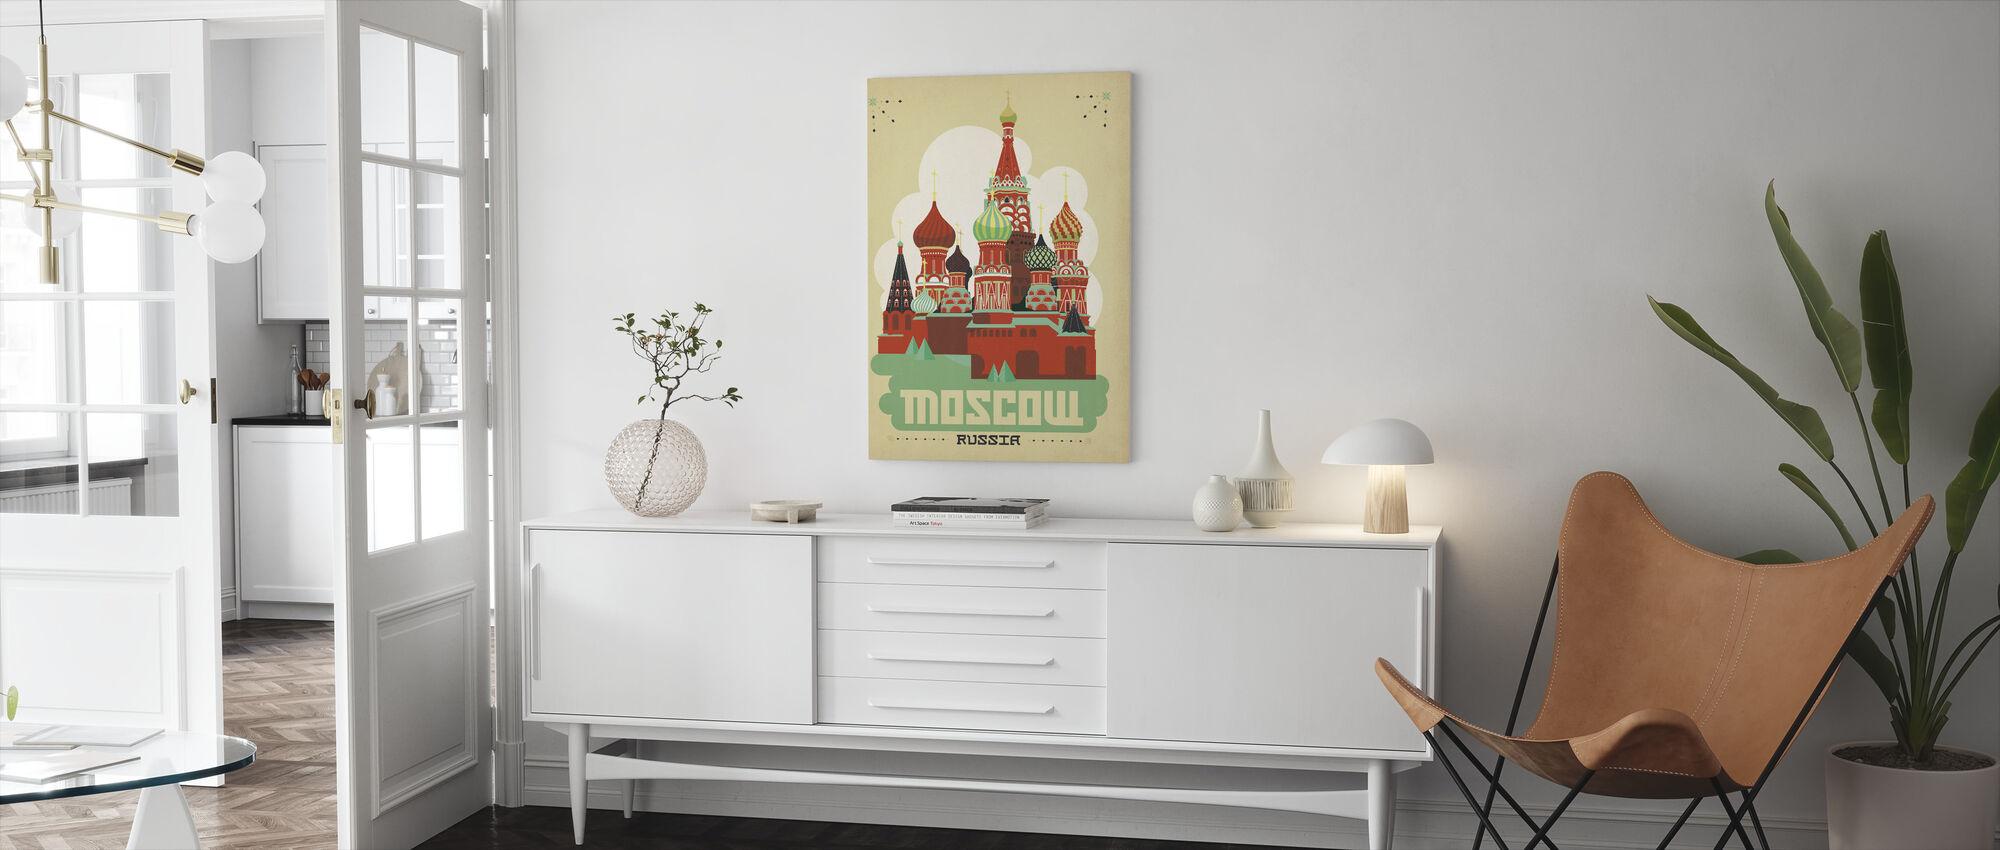 Moskau - Leinwandbild - Wohnzimmer